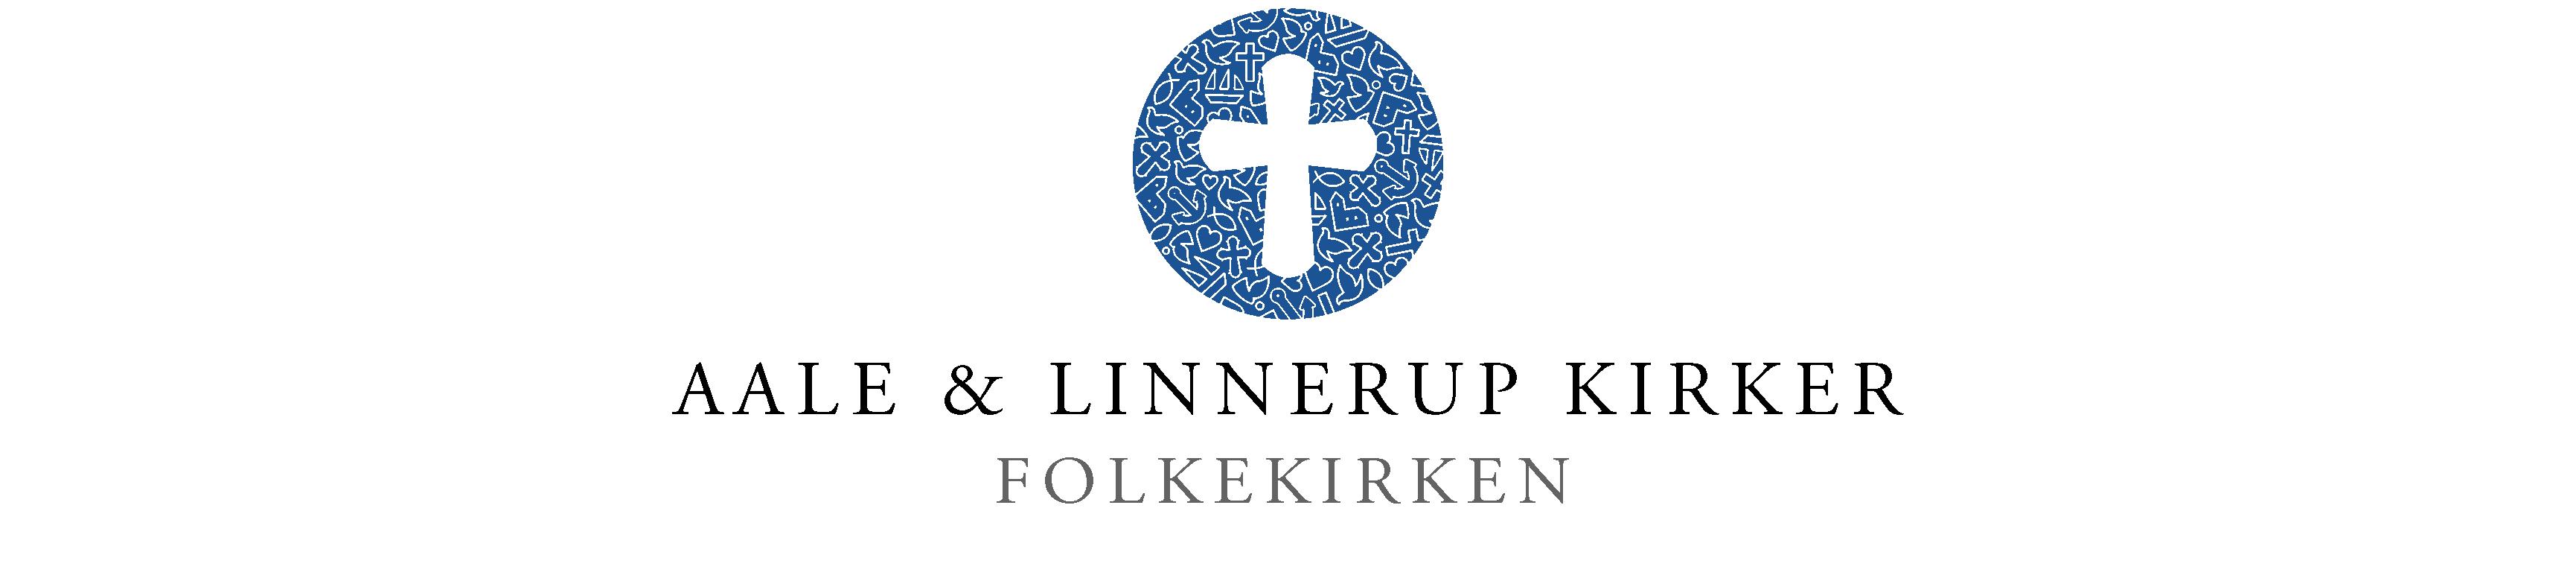 Aale Linnerup Kirker